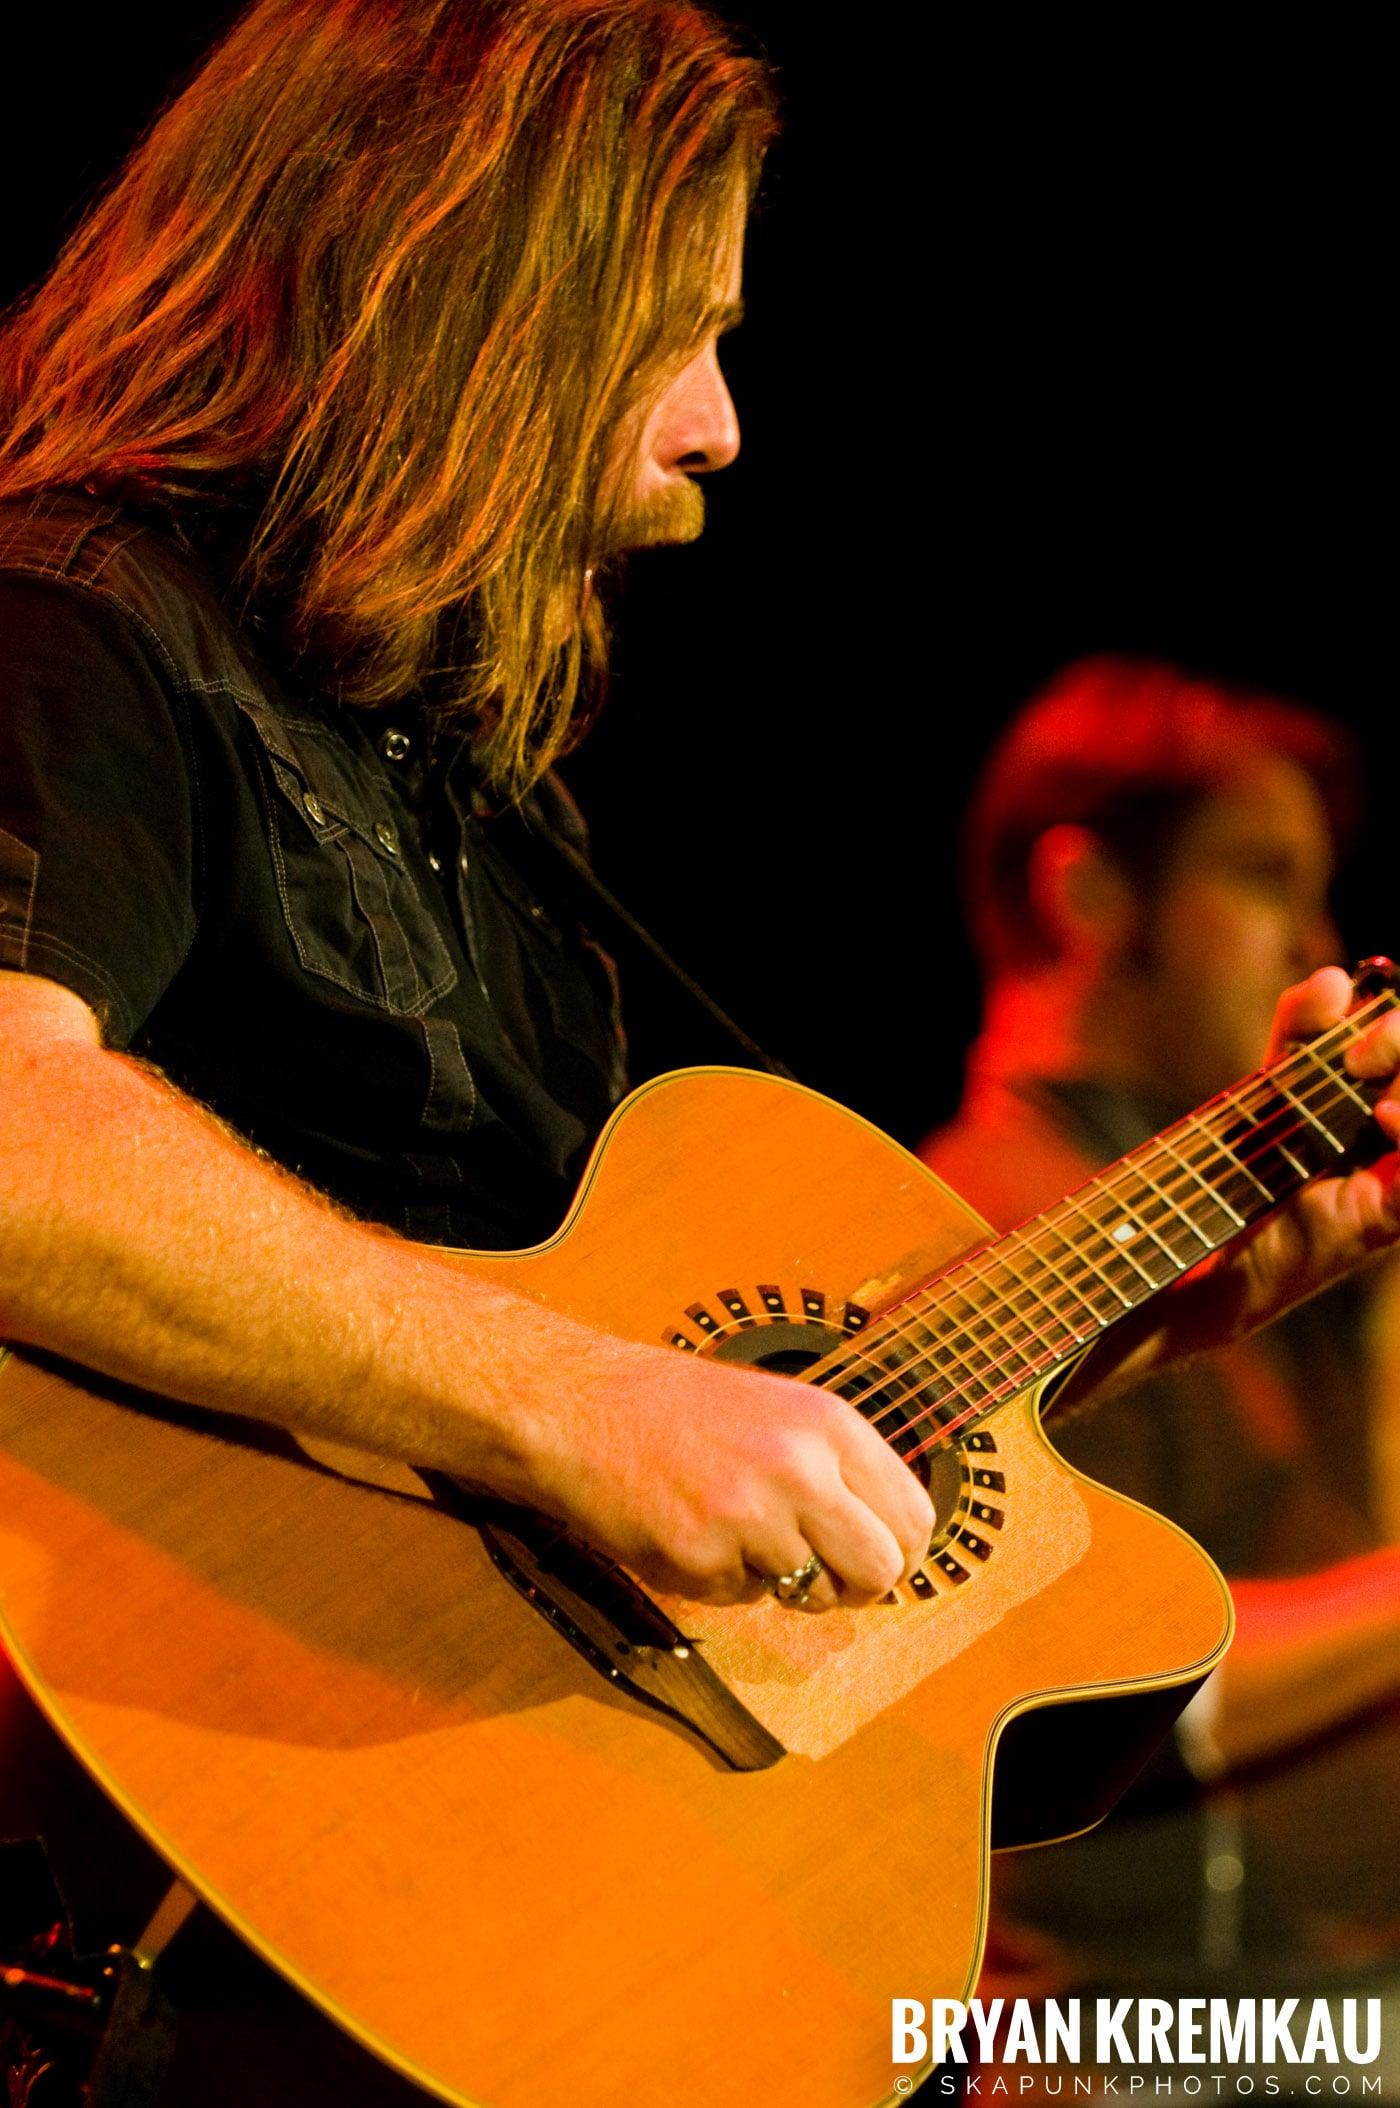 Great Big Sea @ Tarrytown Music Hall, Tarrytown, NY - 10.10.09 (18)